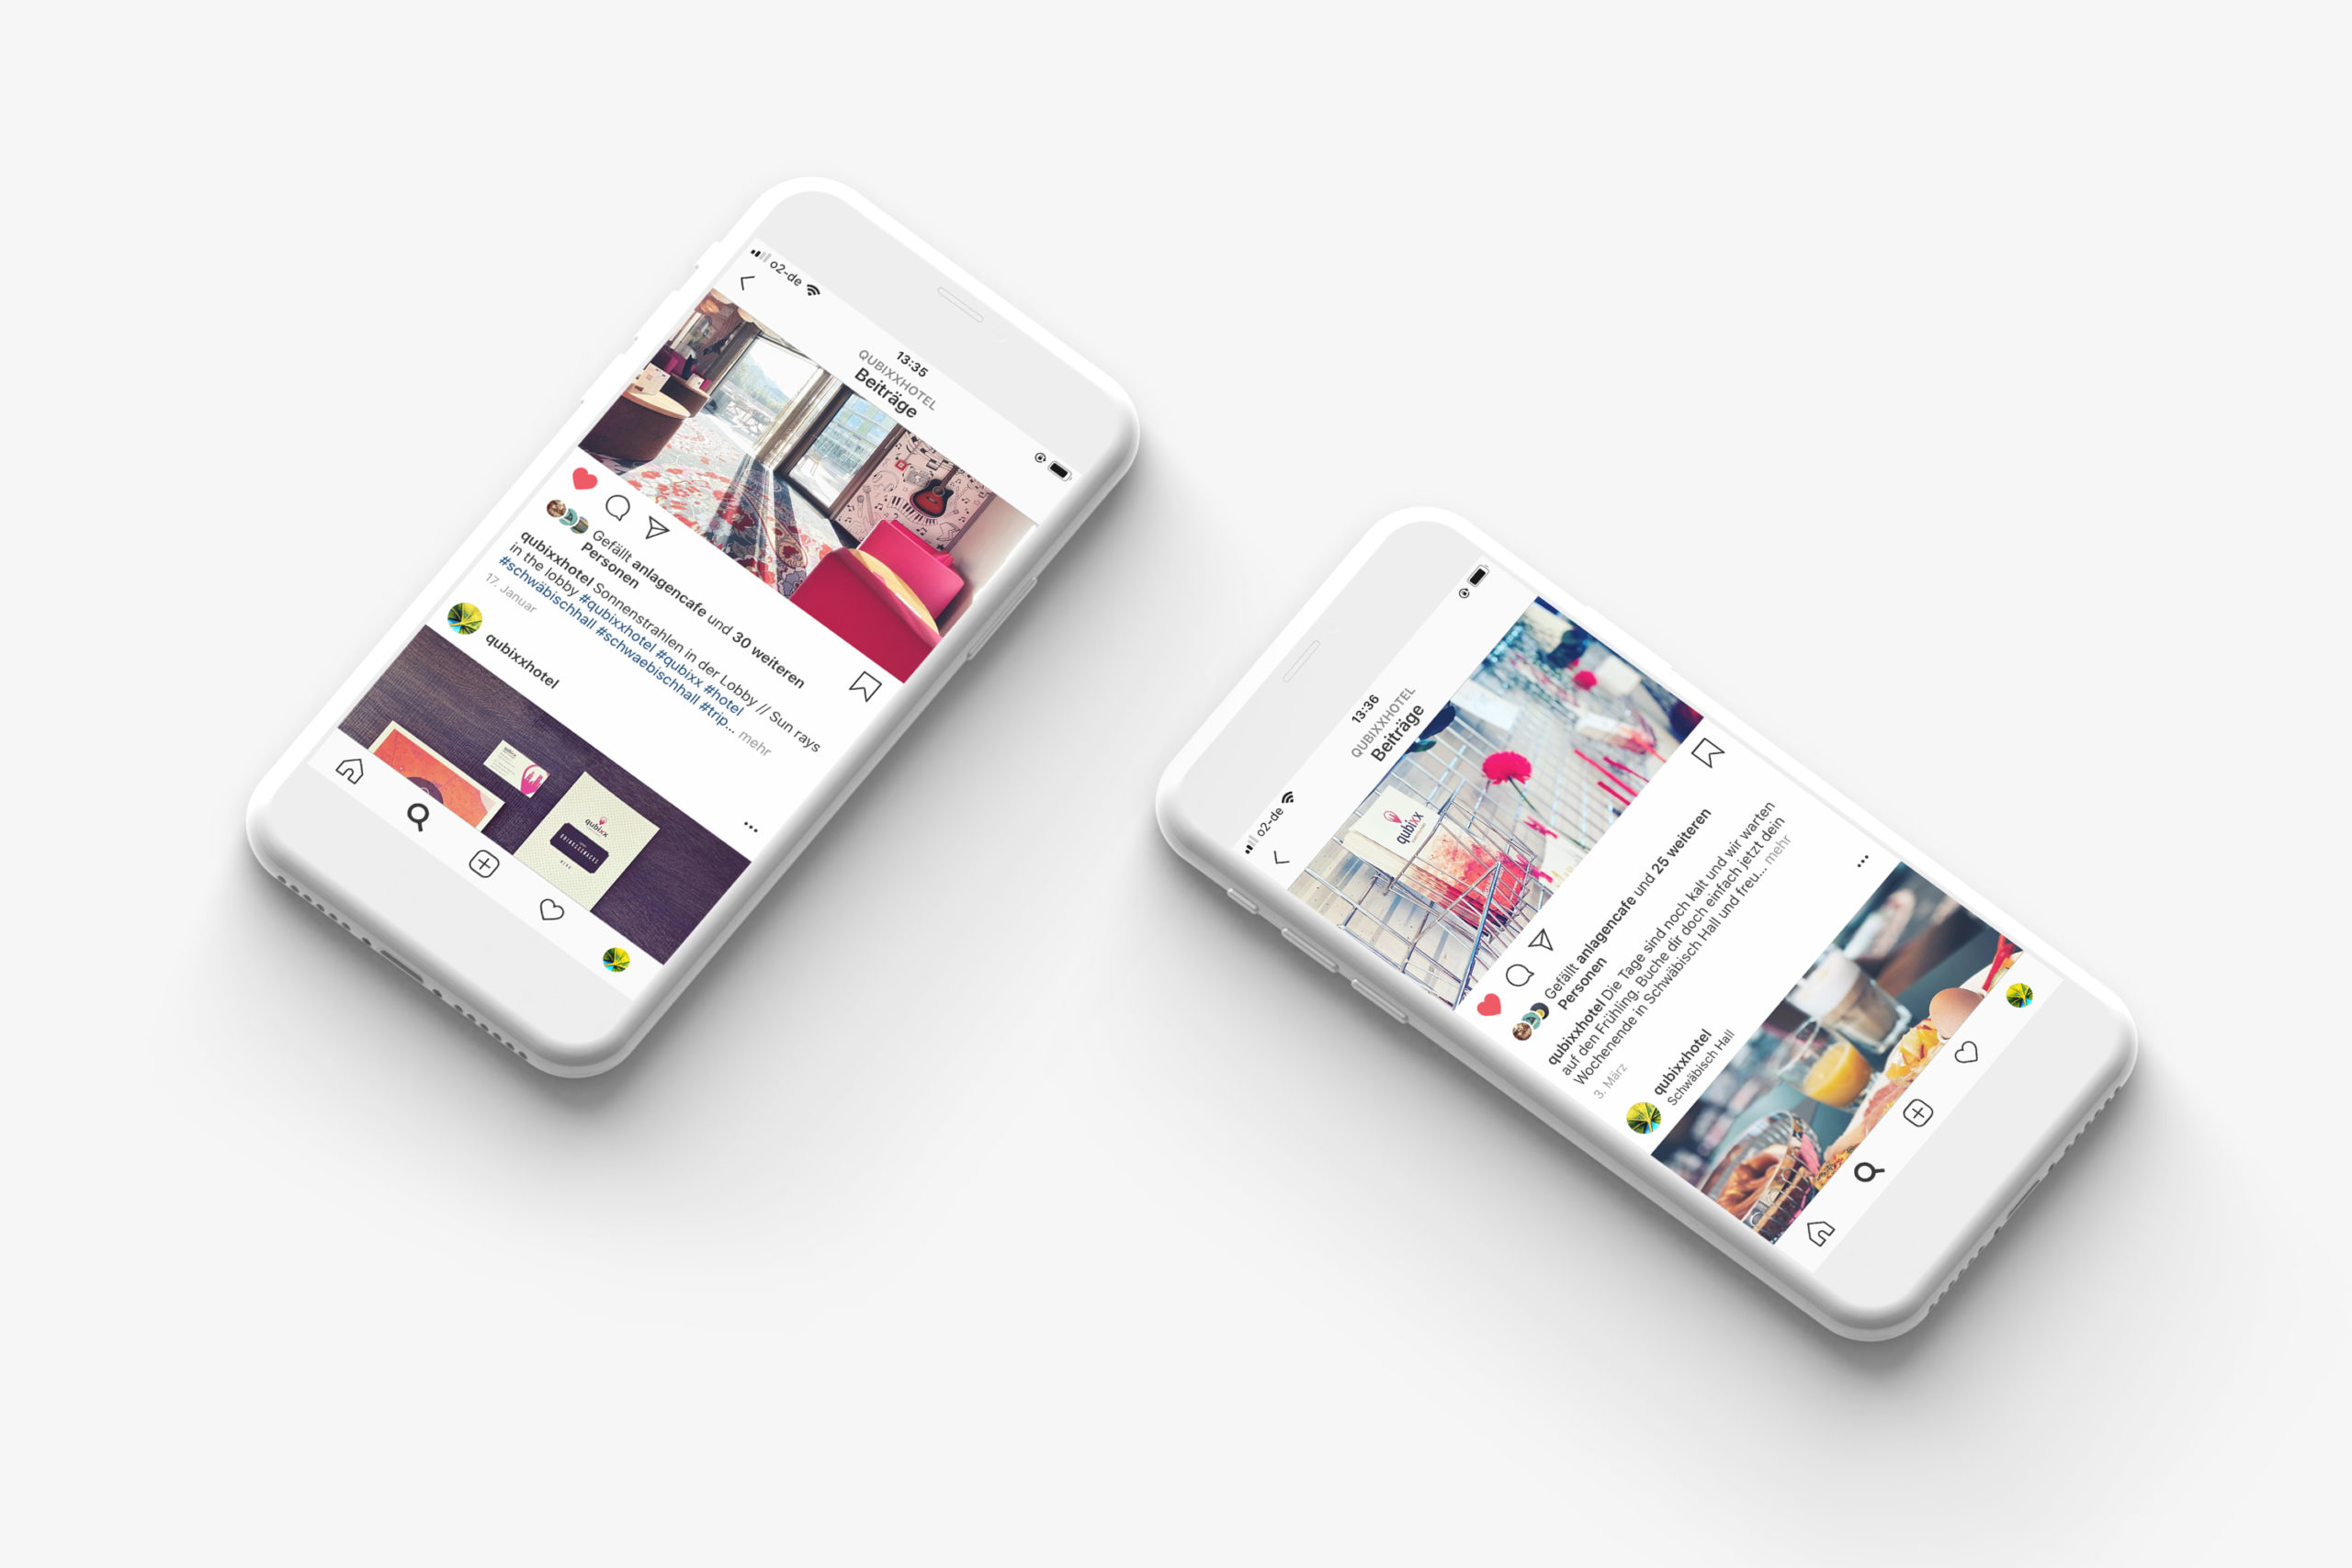 Social Media - publikWERK - Kreativagentur - Werbeagentur - Web Design - Film - Graphic Design - Social Media - Kampagnen - Fotografie - Schwäbisch Hall